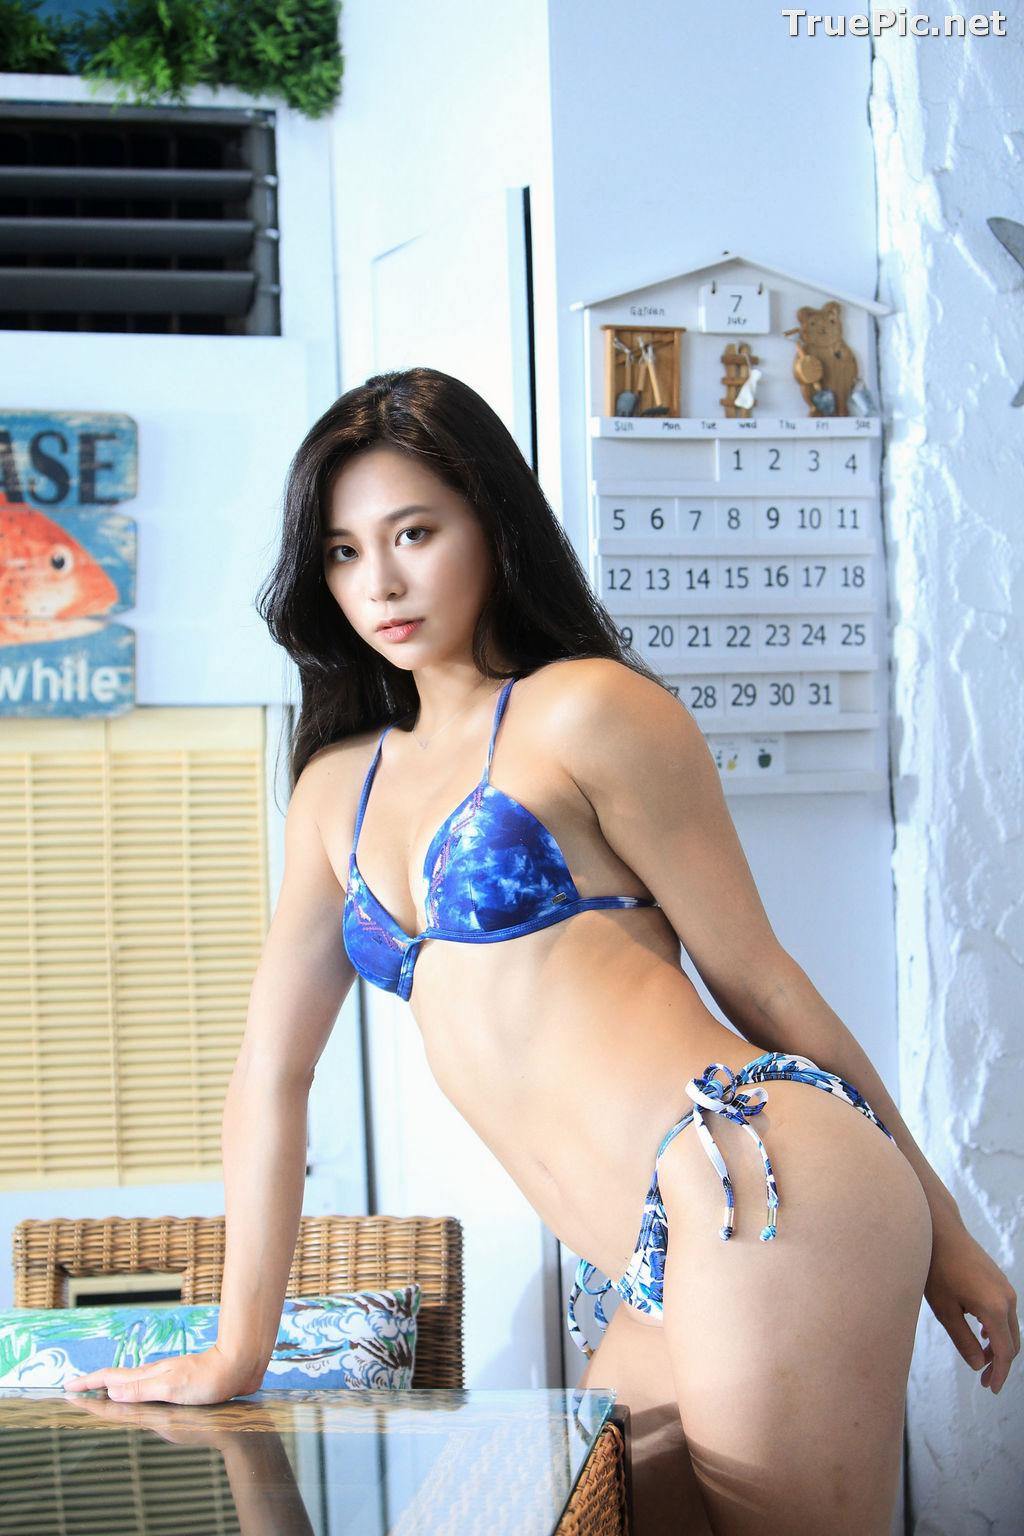 Image Taiwanese Model - Shelly - Beautiful Bodybuilding Bikini Girl - TruePic.net - Picture-63